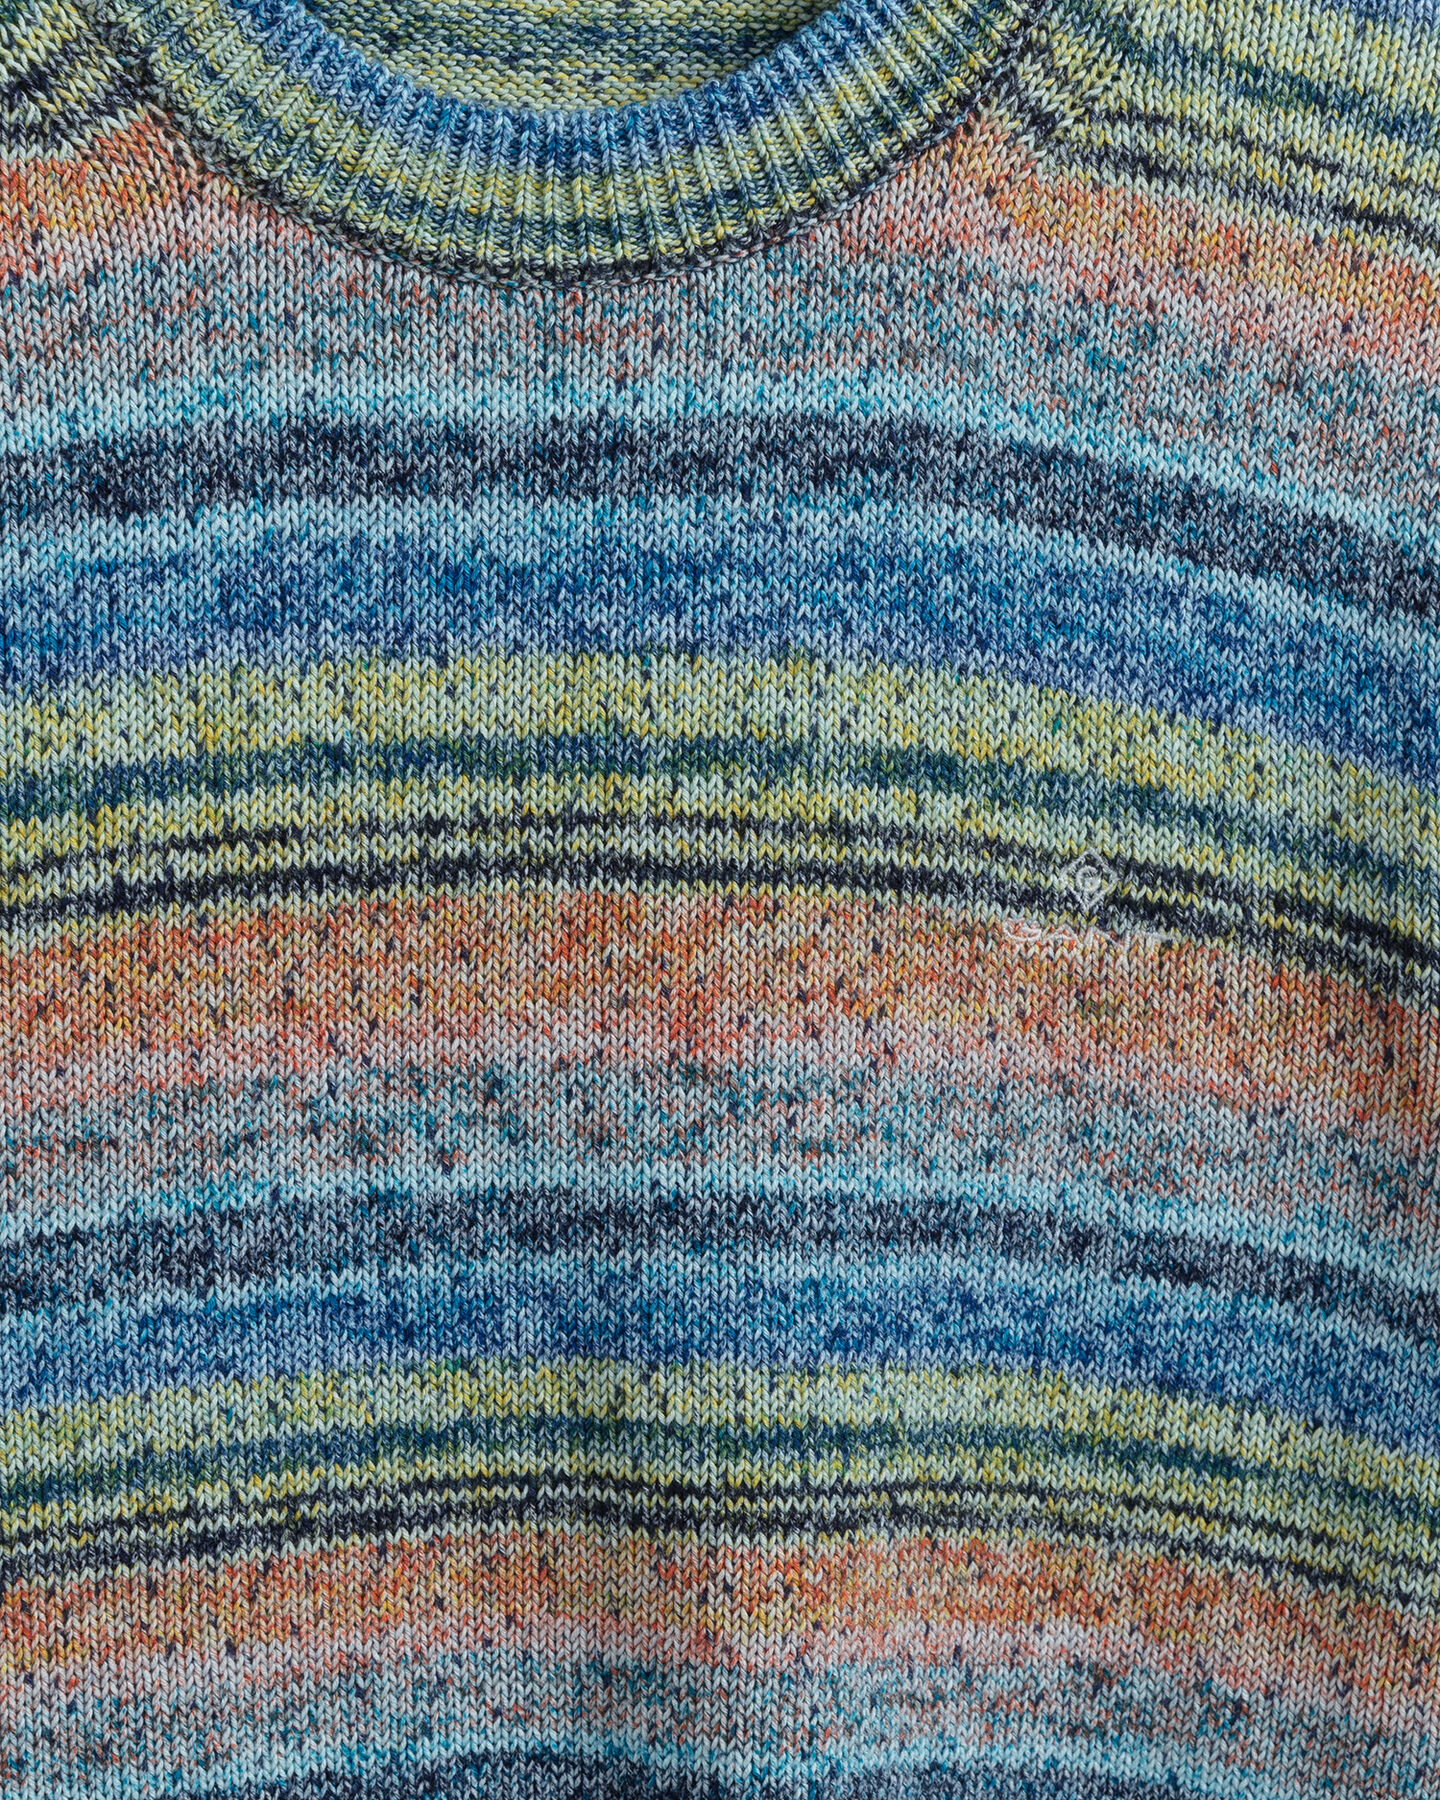 Space-Dyed rundhalsad tröja